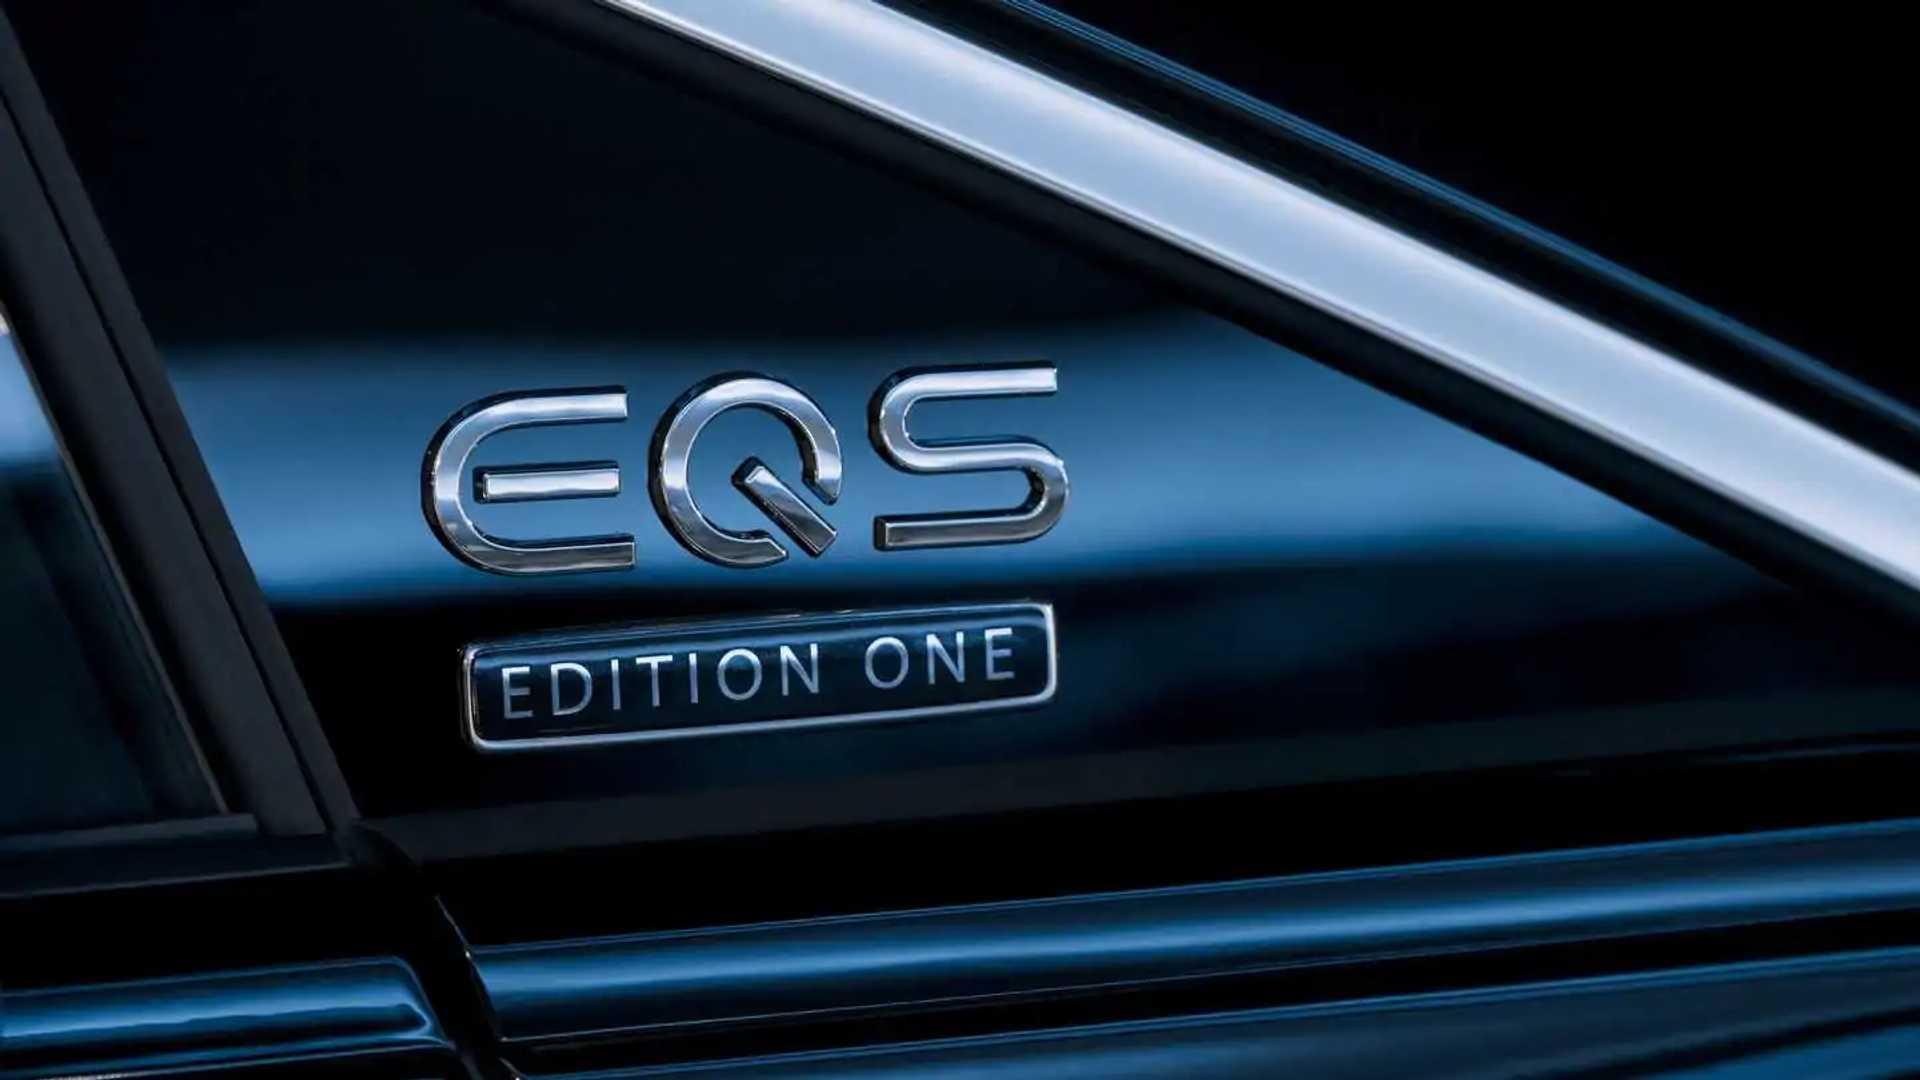 informaçoes sobre o novo eqs 2022-mercedes-benz-eqs-580-edition-one-exterior-badge